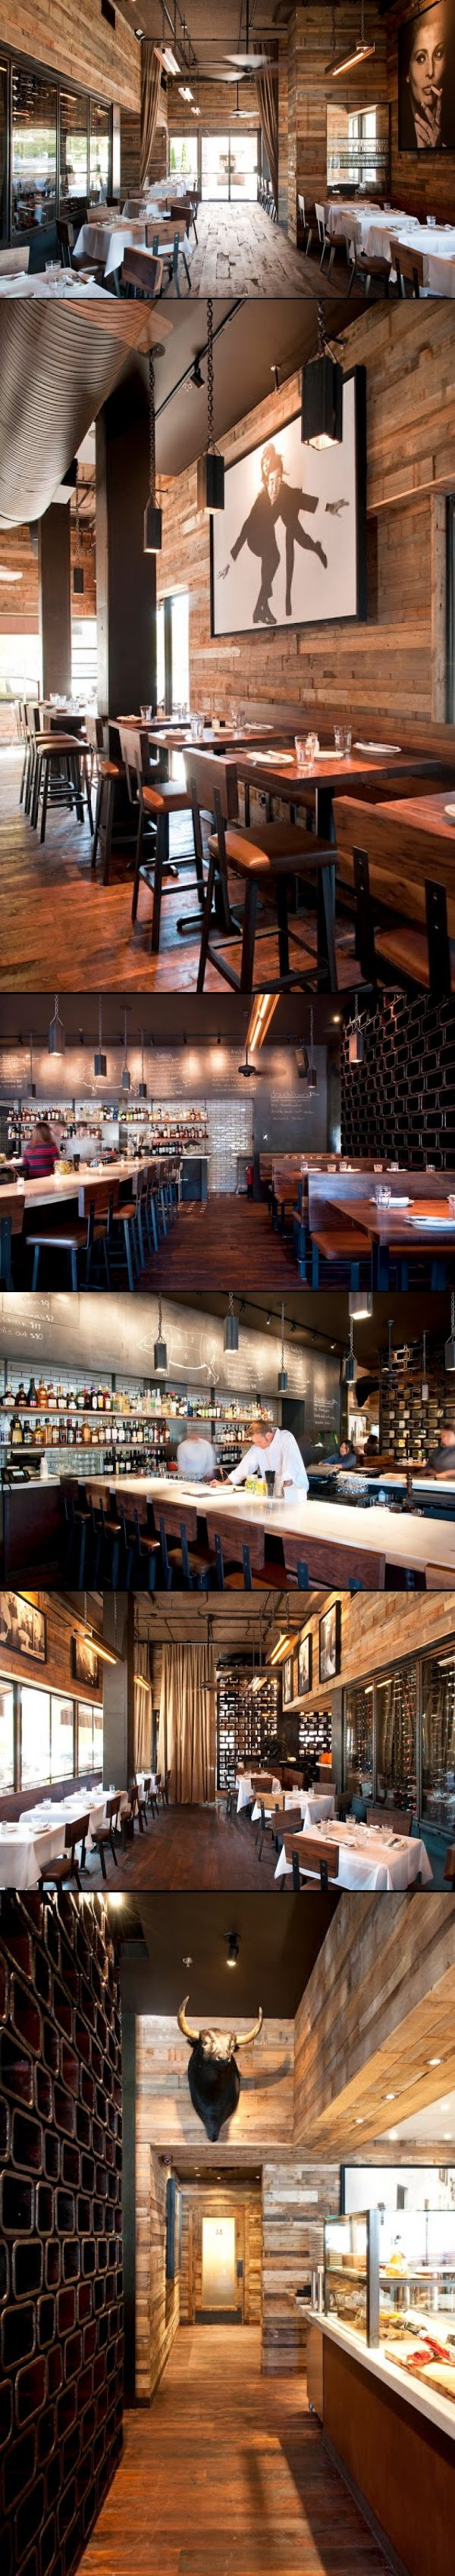 Best 25 Wine Bar Restaurant Ideas On Pinterest Bar